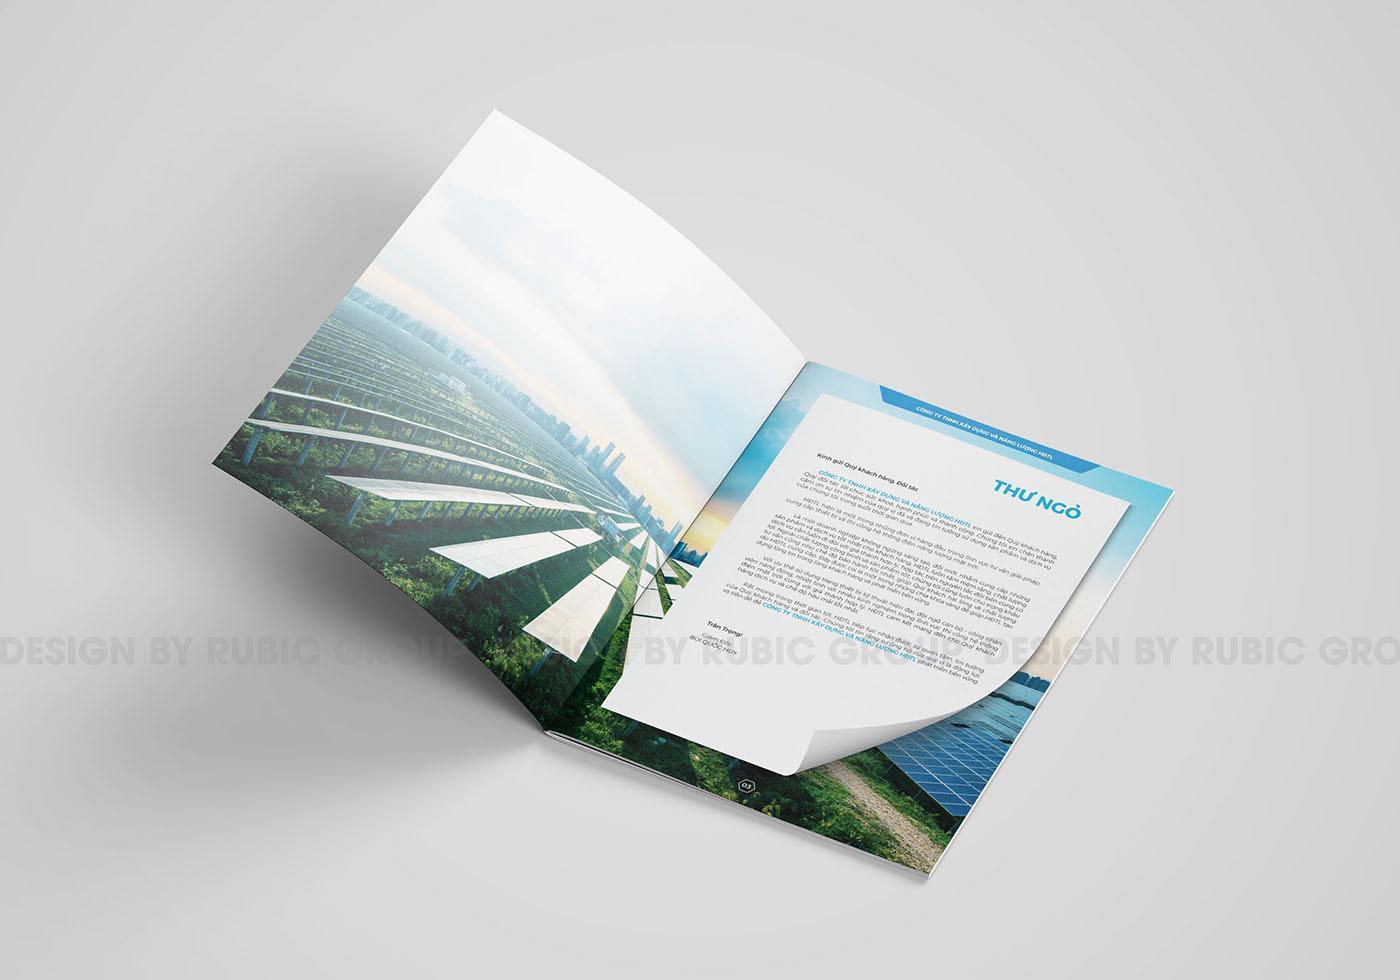 điện mặt trời hdtl 3